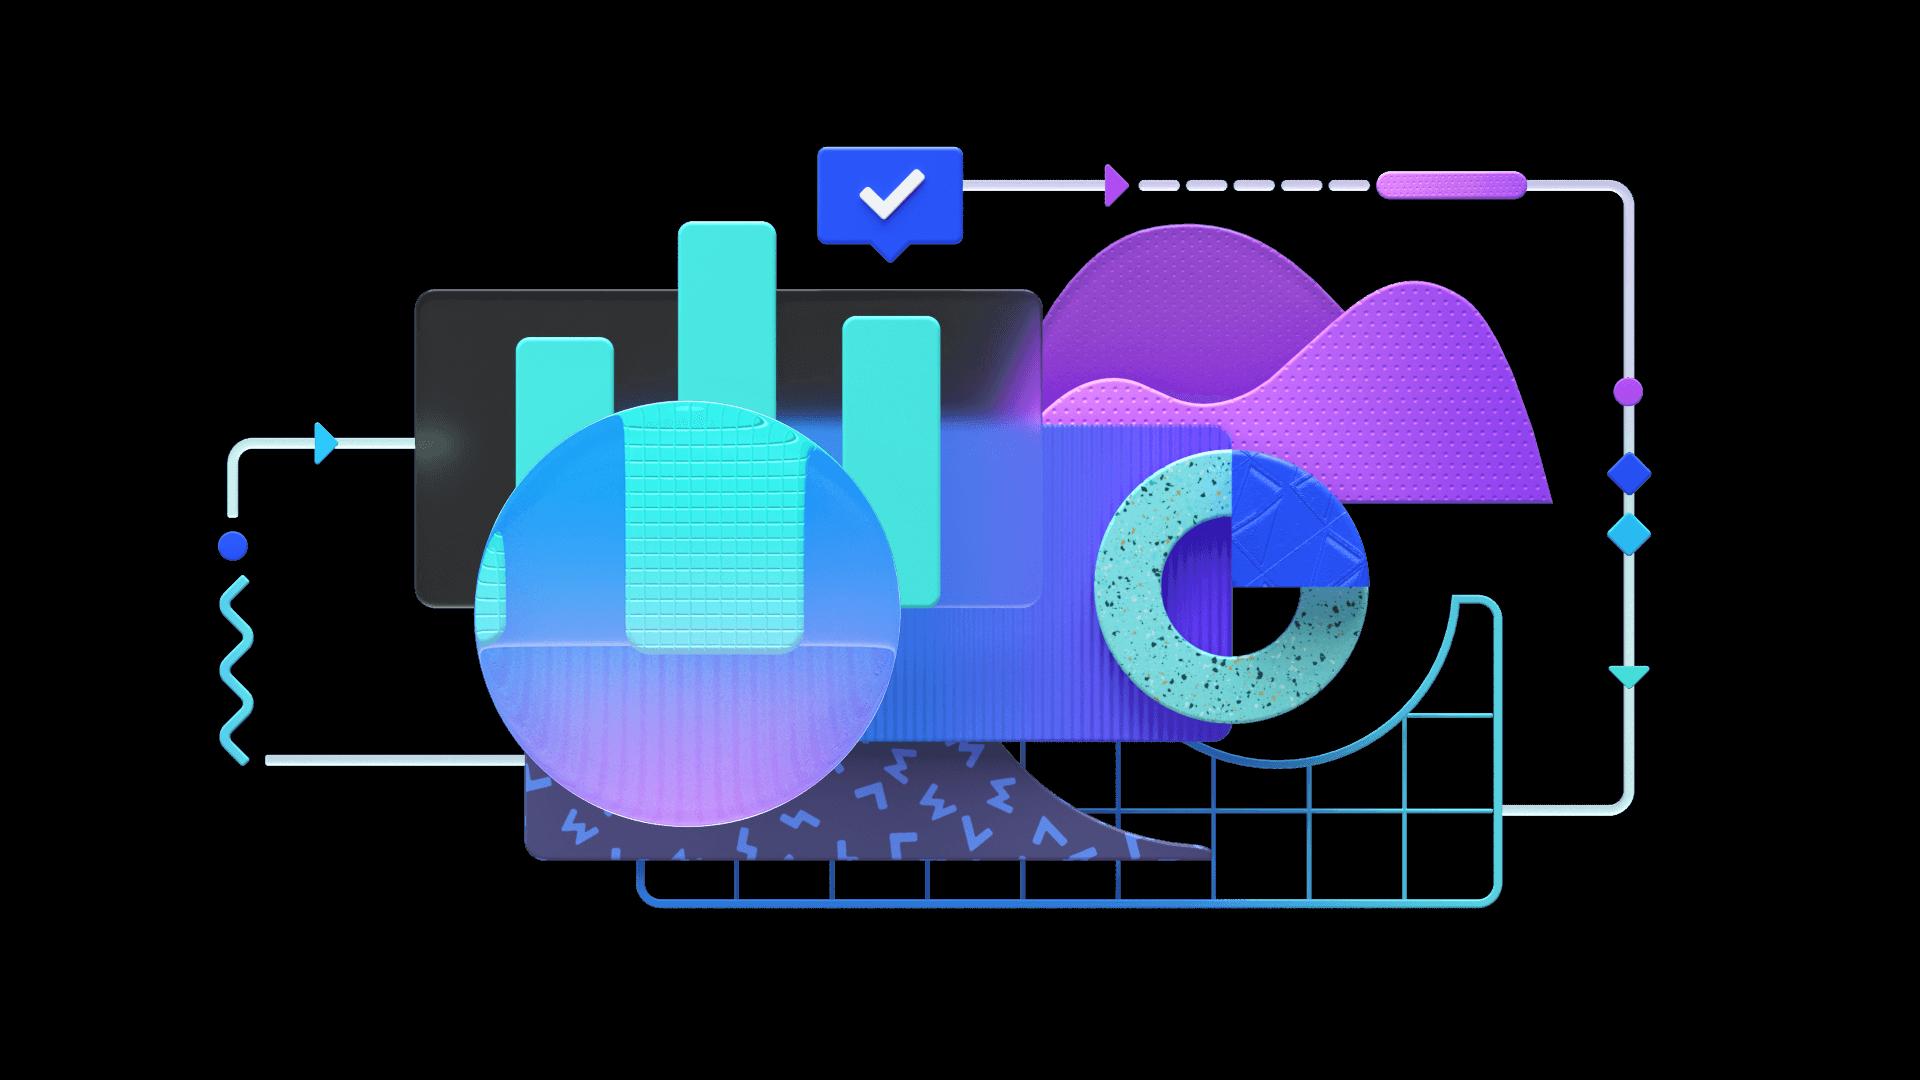 Colorful illustration showcasing Range's data services